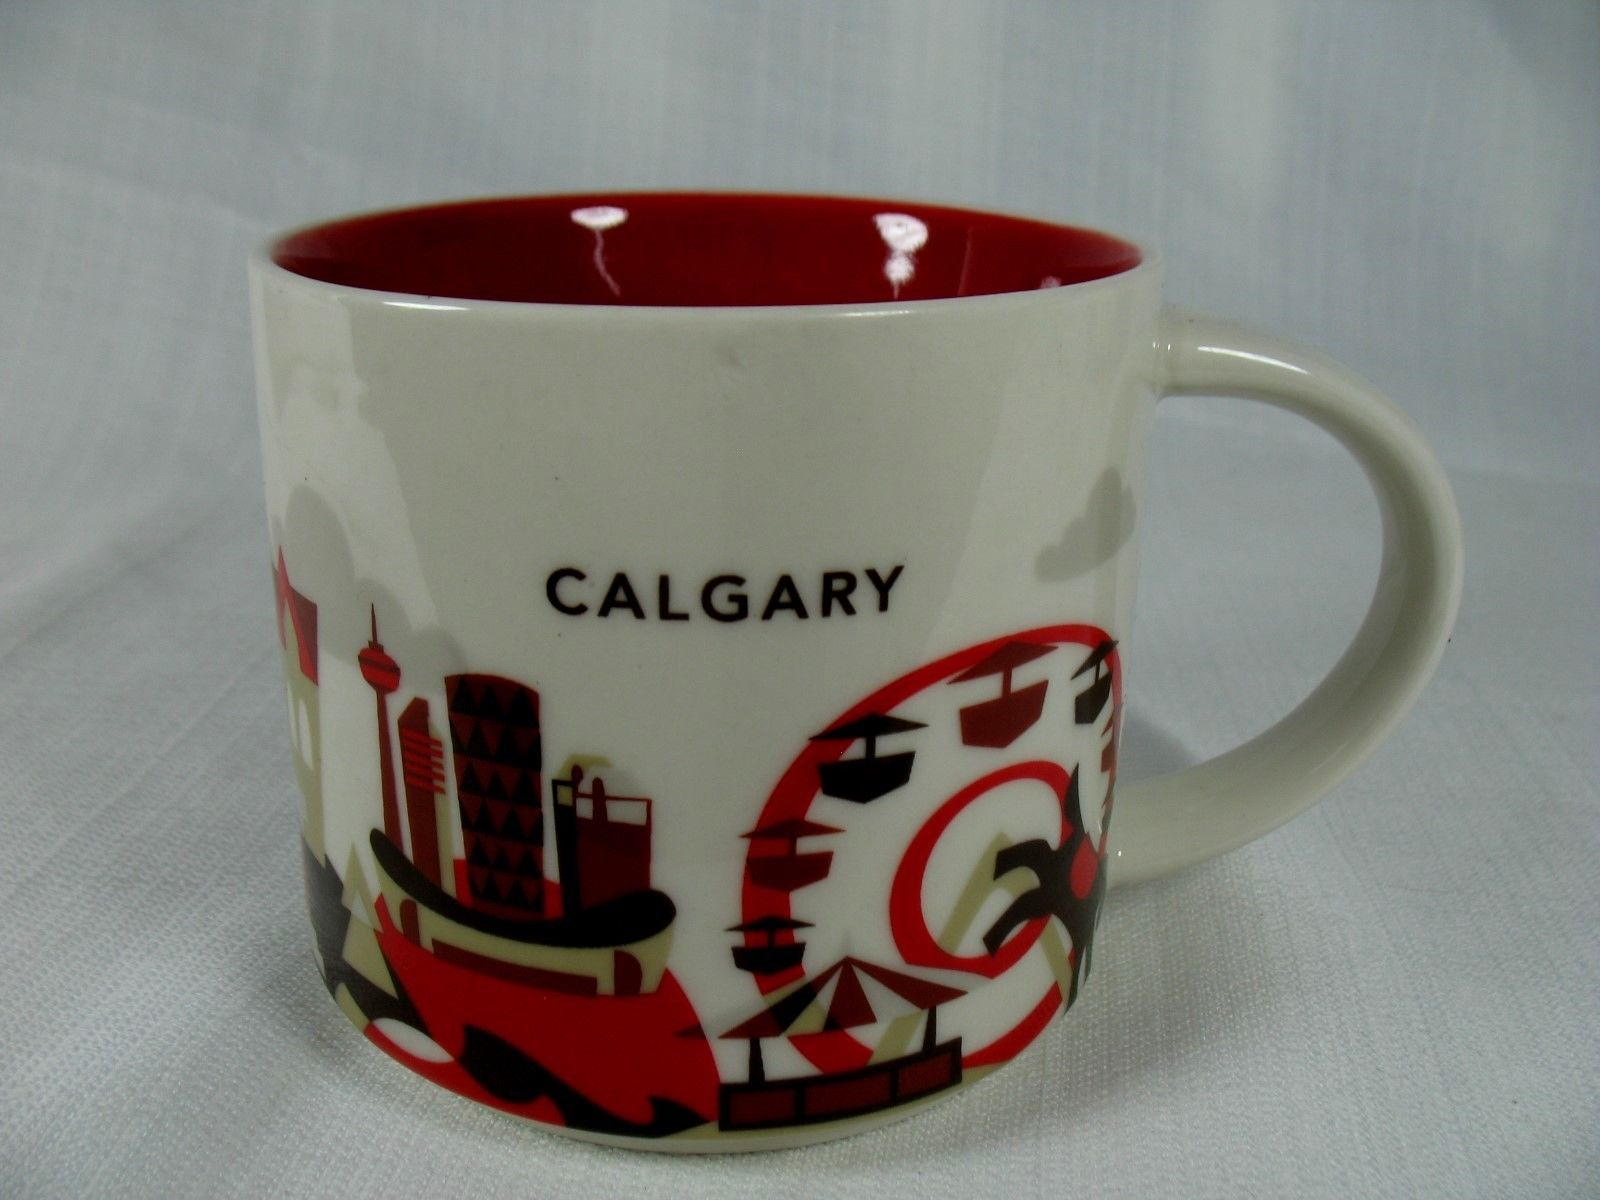 Mugs CalgaryStarbucks City CalgaryStarbucks CalgaryStarbucks Mugs CalgaryStarbucks Mugs Mugs City City Mugs CalgaryStarbucks CalgaryStarbucks City City W29DHEI